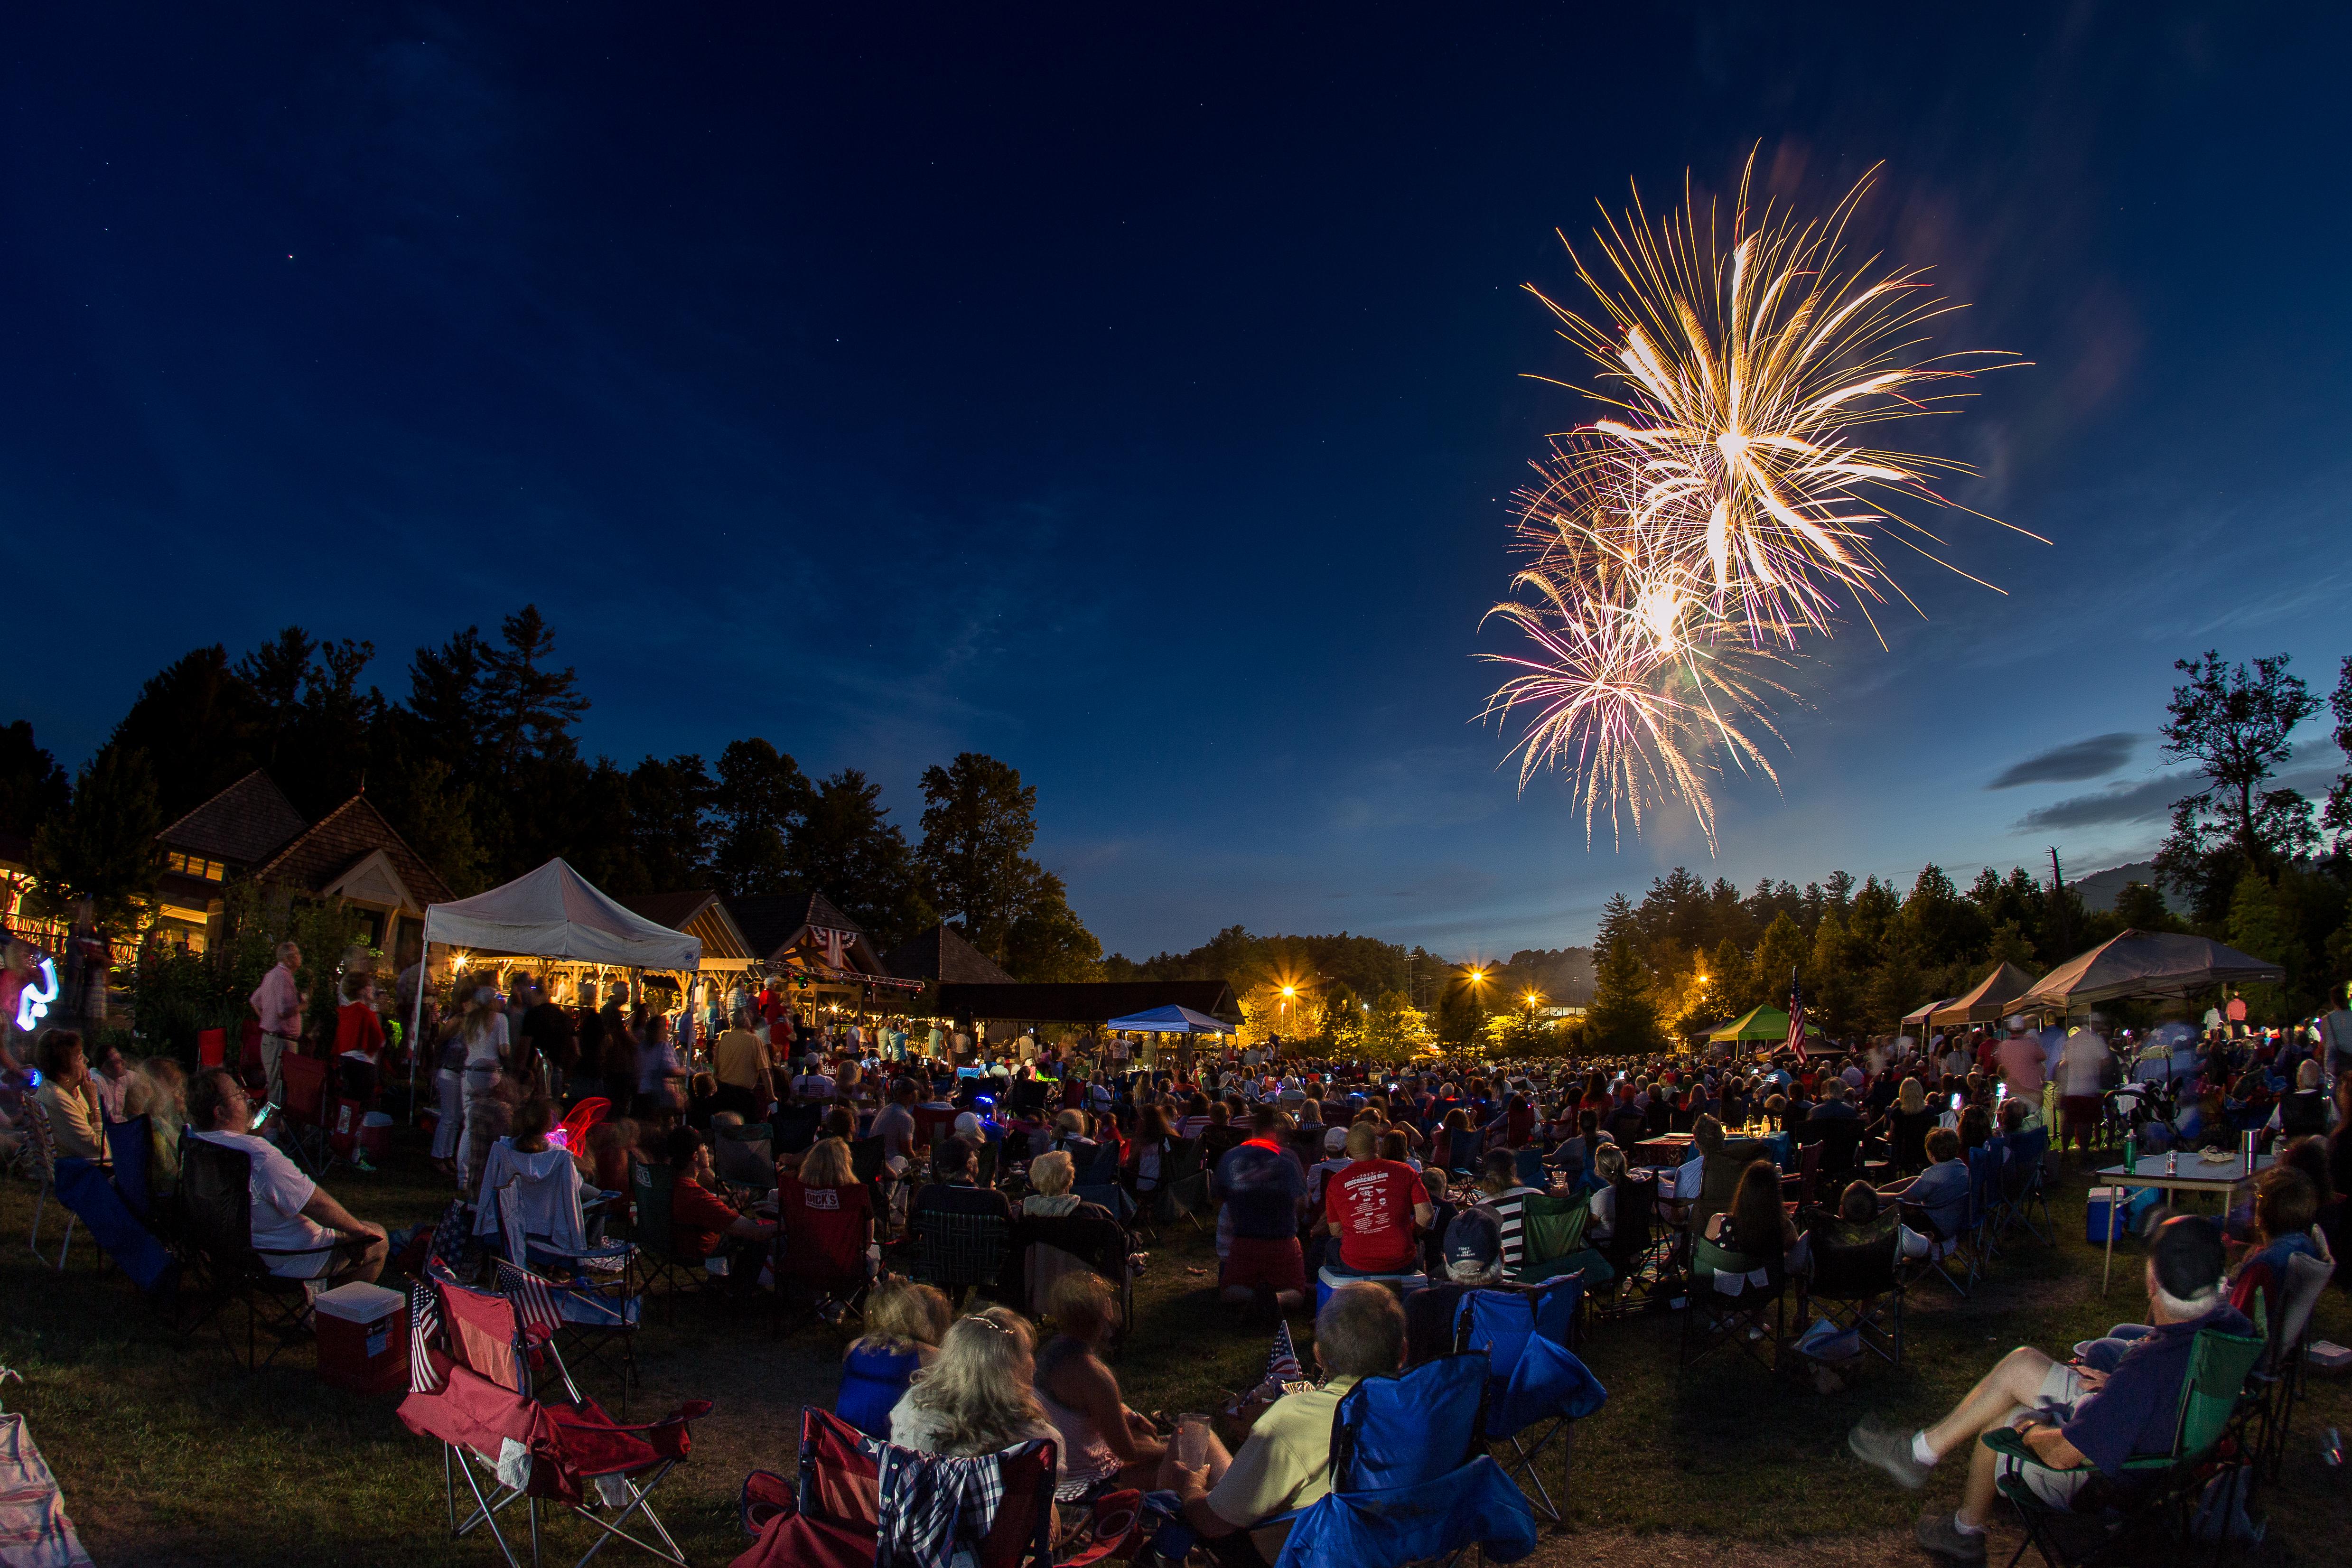 Fireworks This Weekend